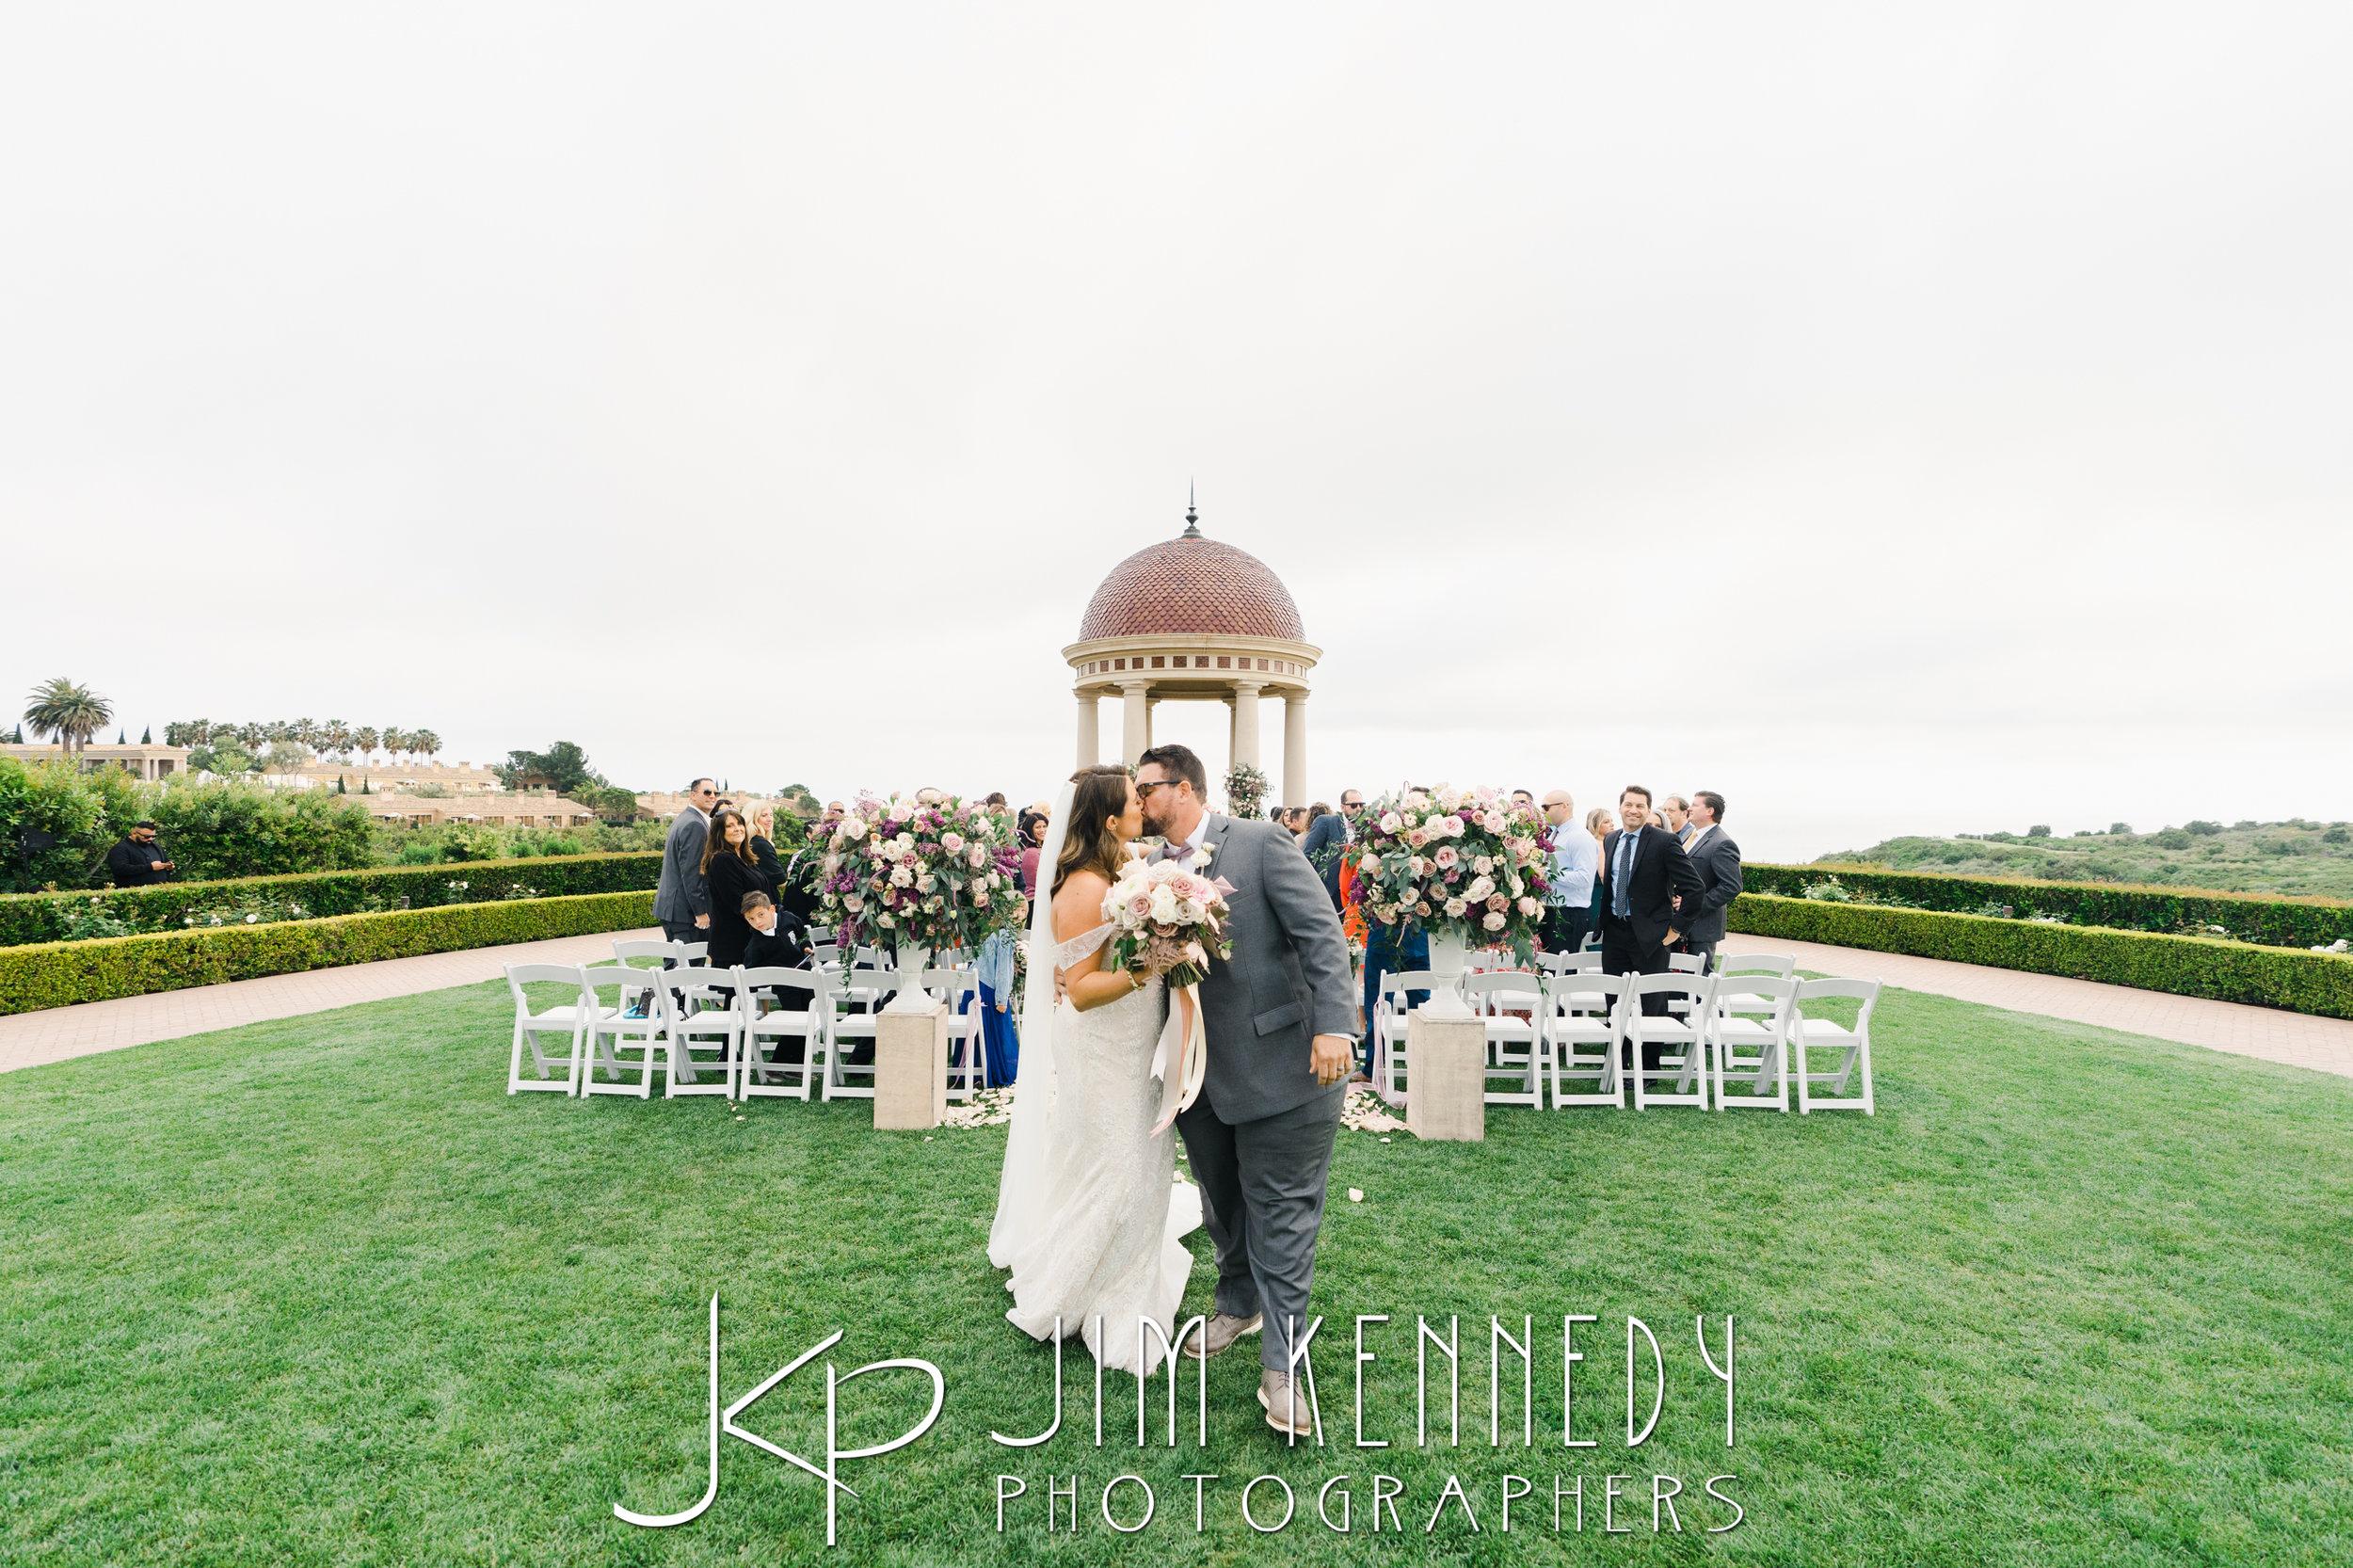 pelican-hill-wedding-jim-kenedy-photographers_0132.JPG